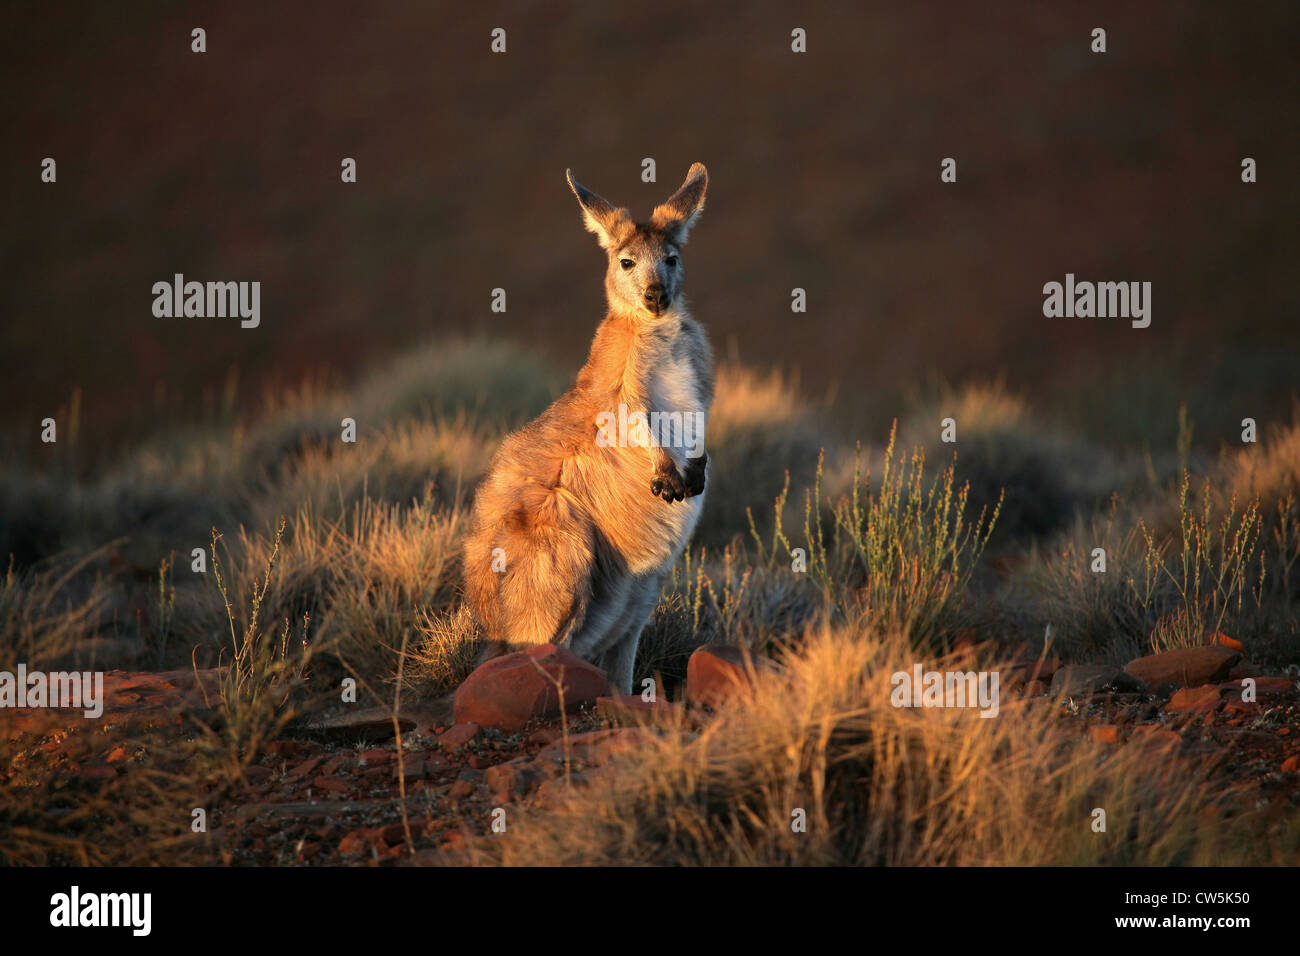 Kangaroo dans une forêt, Flinders Ranges, Australie du Sud, Australie Photo Stock